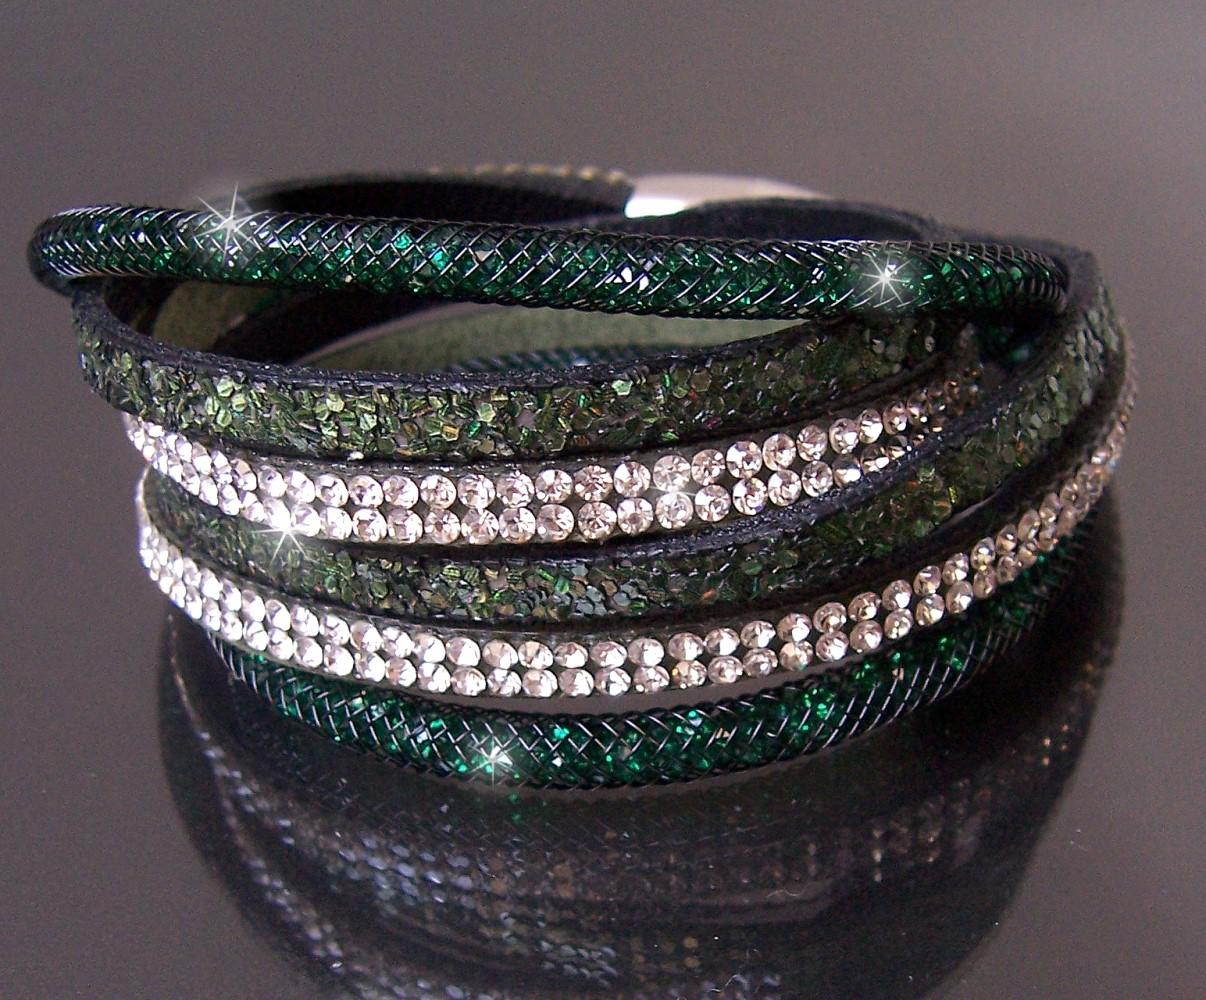 Armband Wickelarmband Netzschlauch Leder Glitzer Strass grün A2054